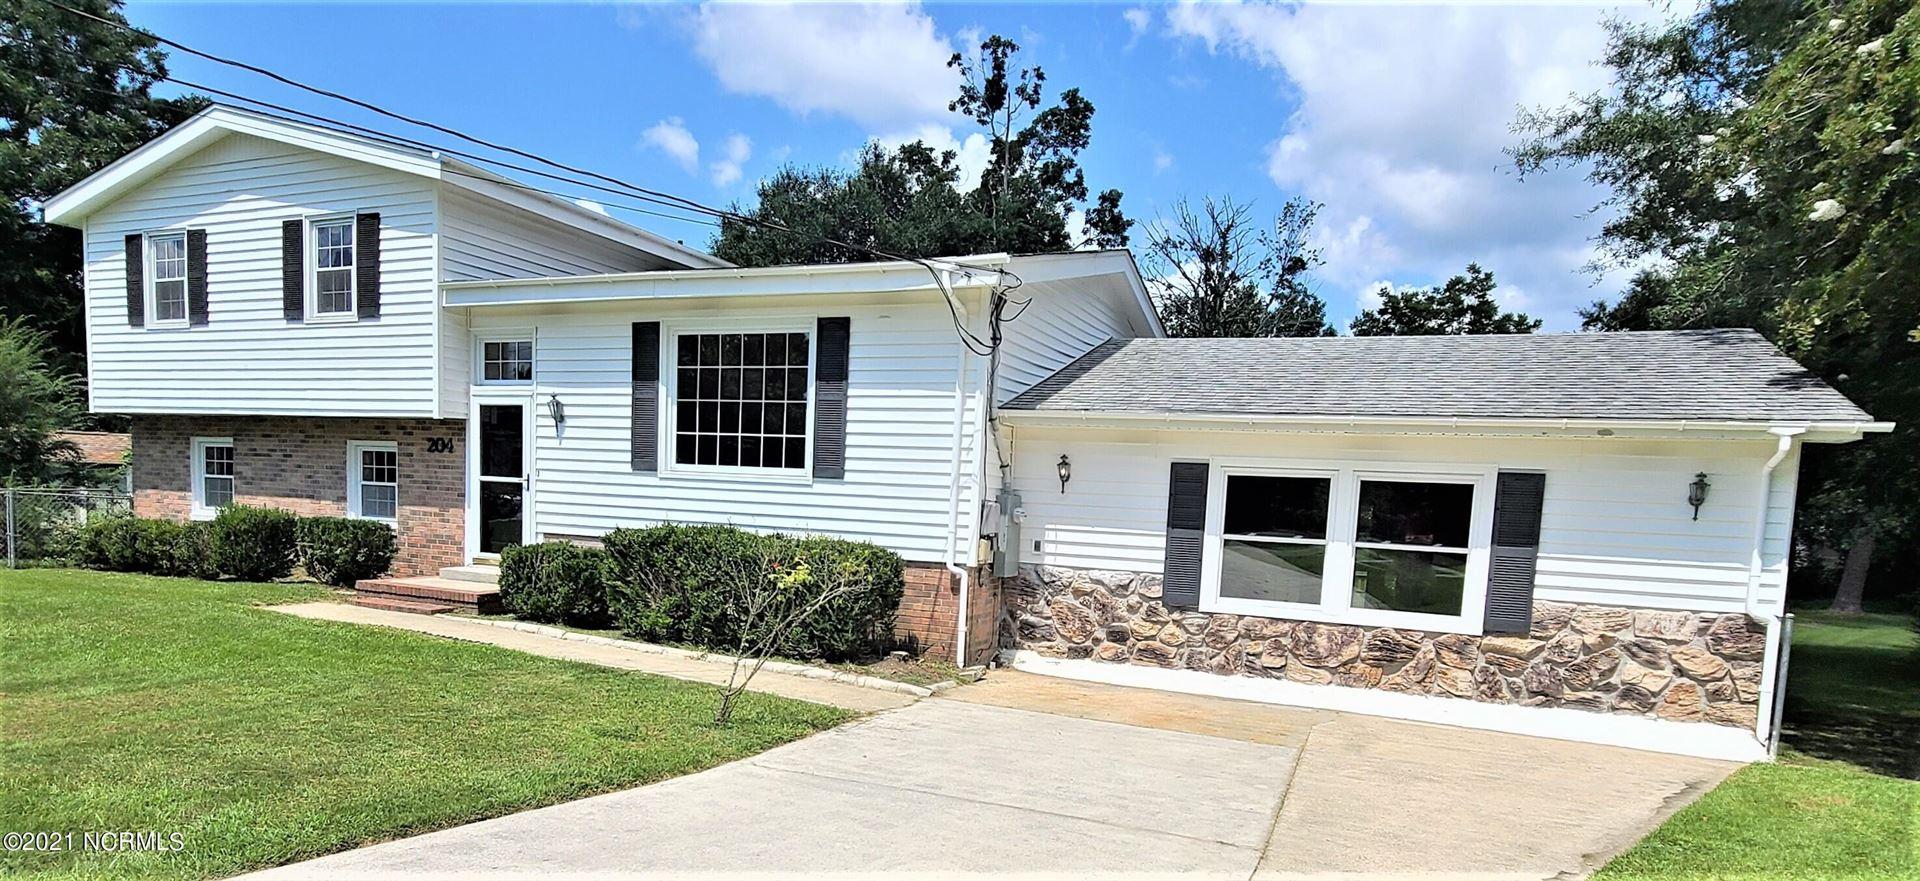 Photo of 204 Jupiter Court, Jacksonville, NC 28546 (MLS # 100287742)